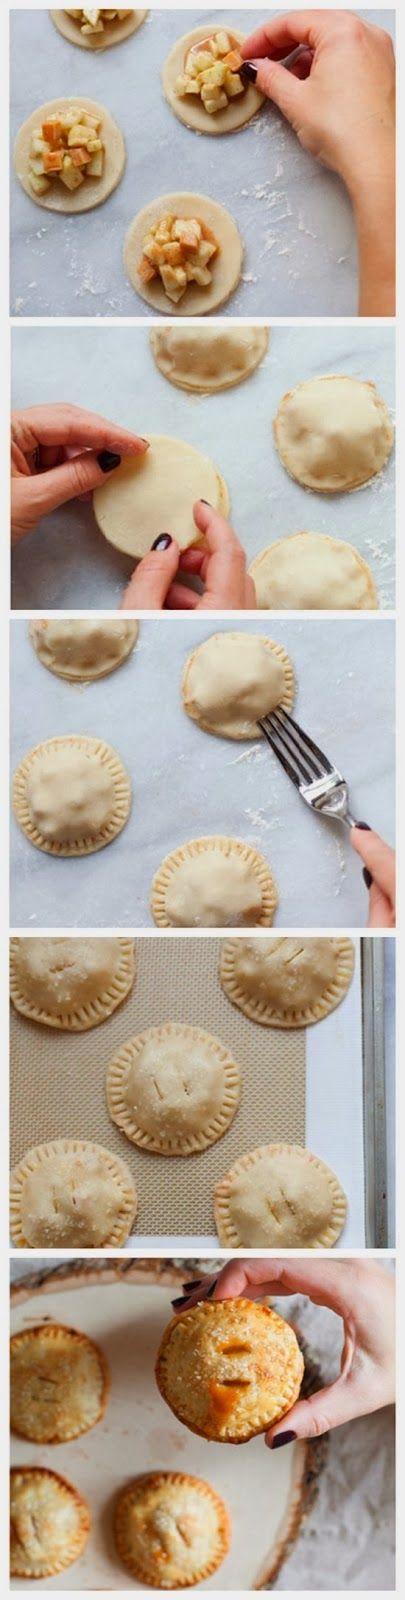 Mini Caramel Apple Pies | Food Blog